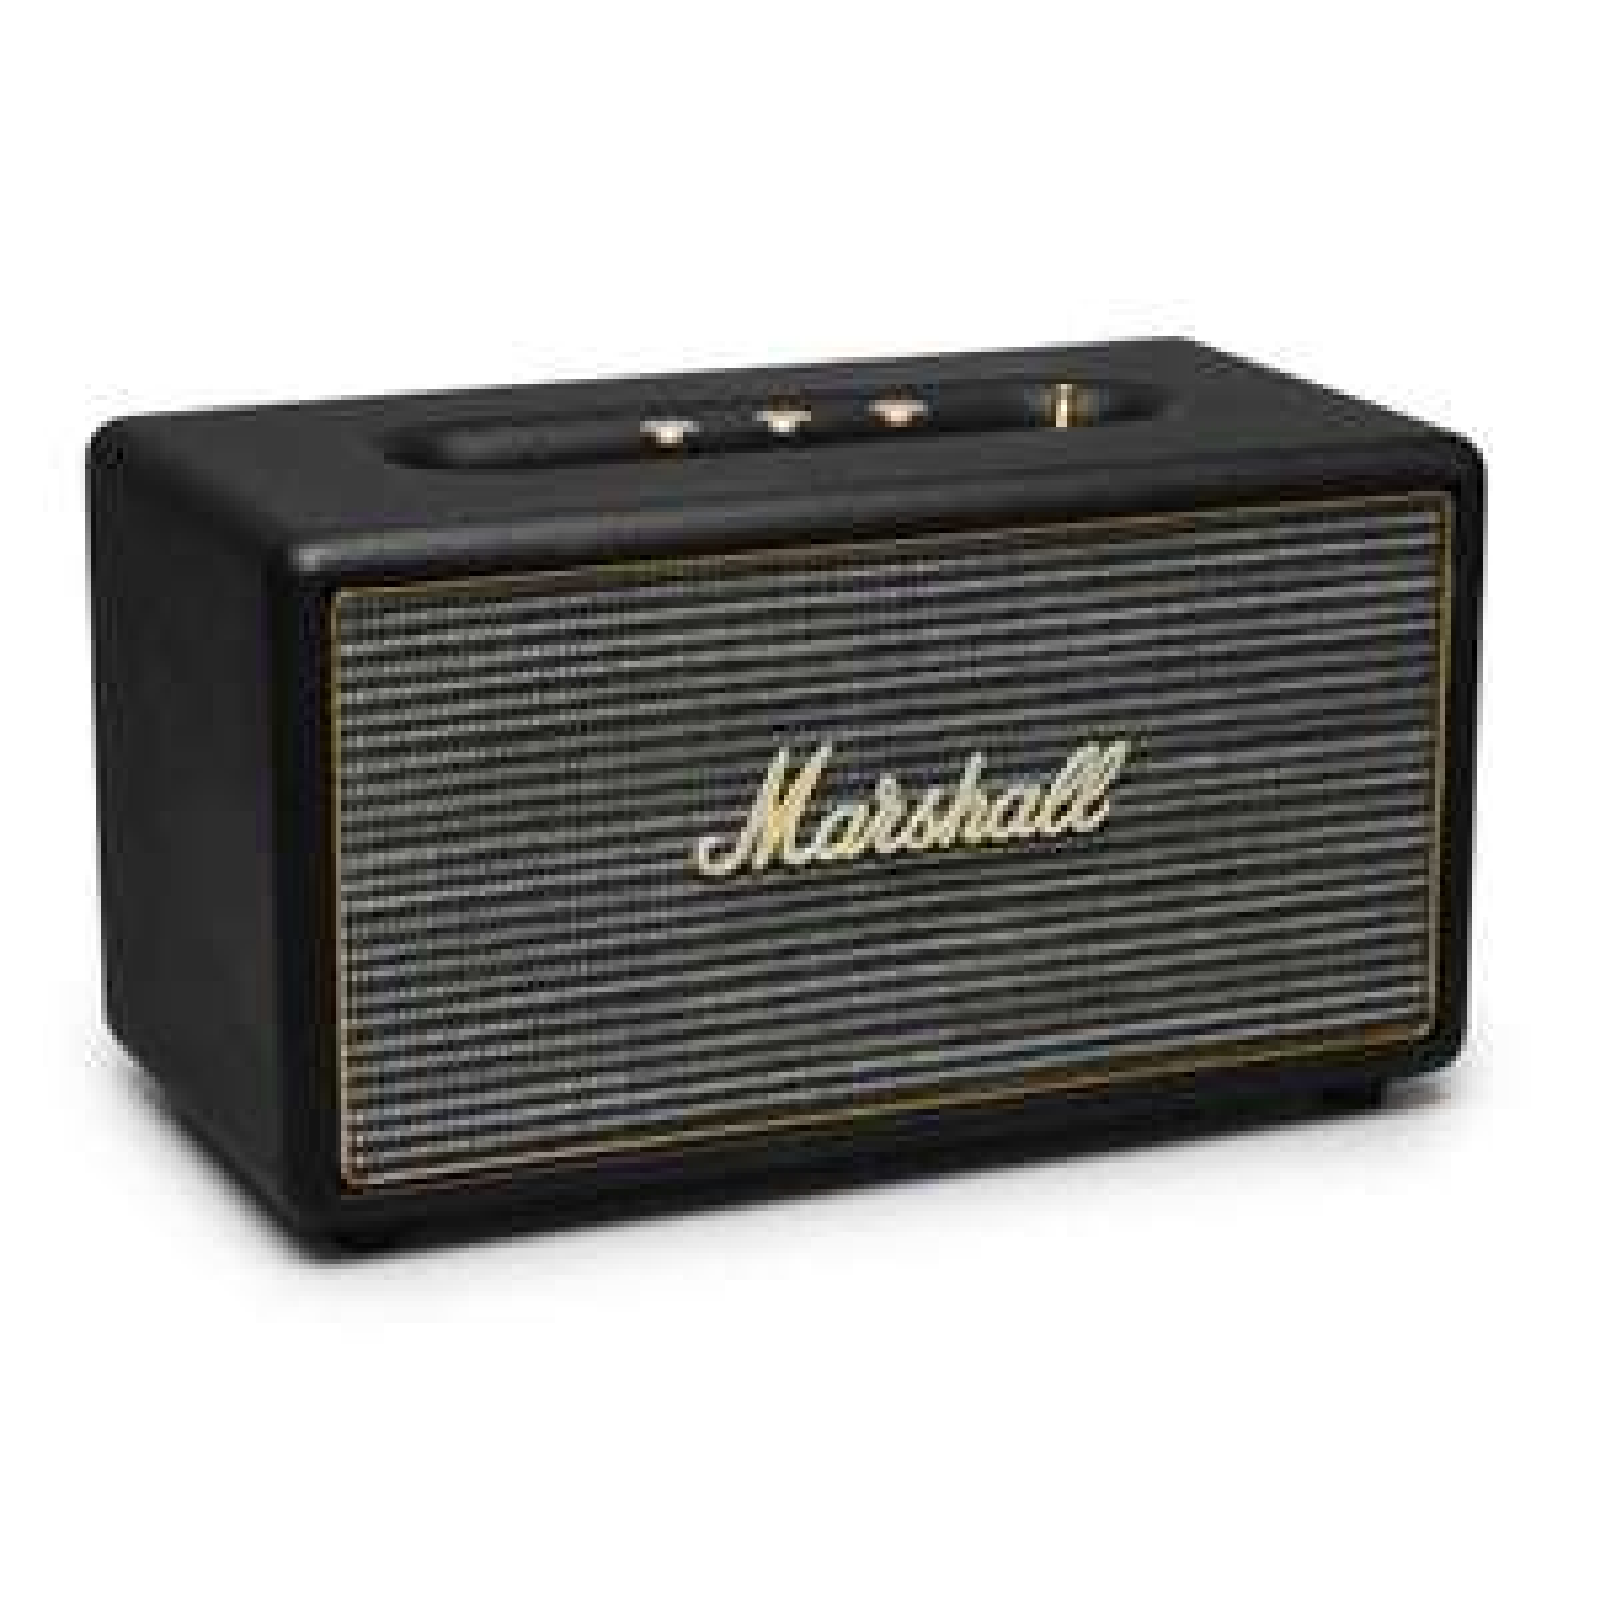 [B4F] Marshall BT Lautsprecher Stanmore, schwarz